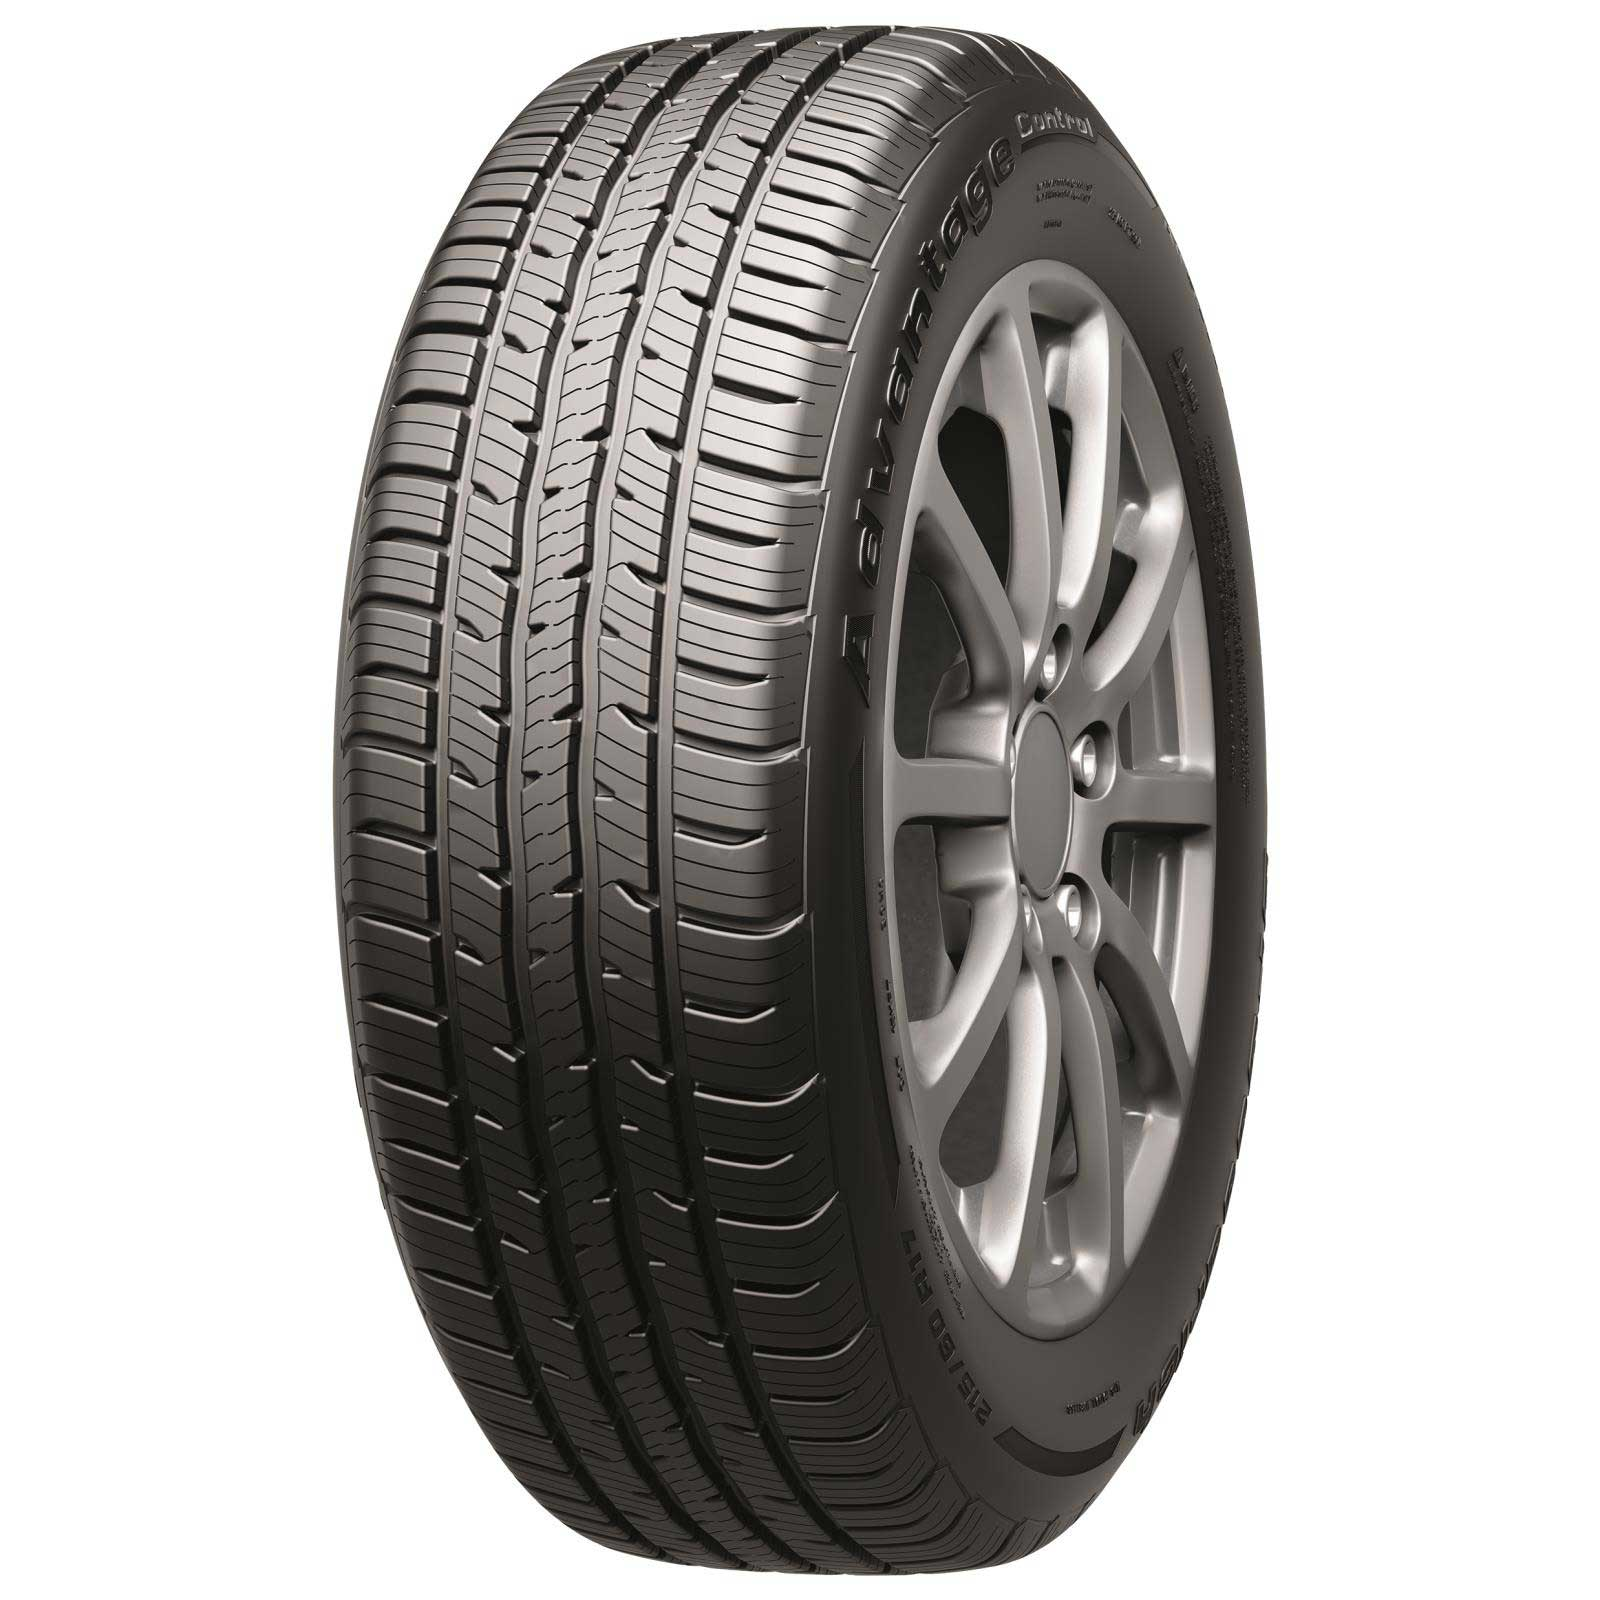 BFGoodrich Advantage Control all-season tire